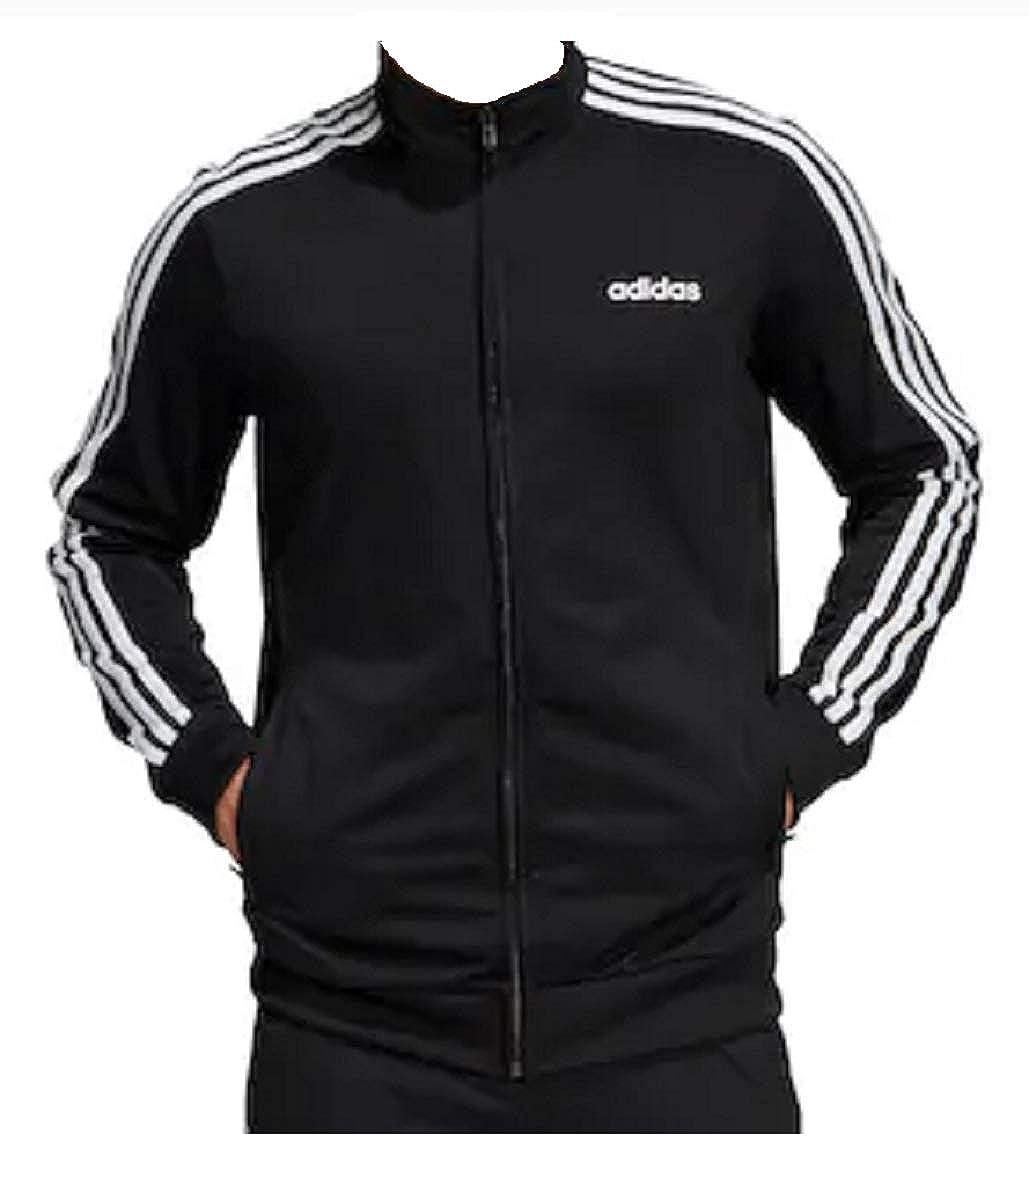 adiidas Youth 3-Stripes Track Jacket